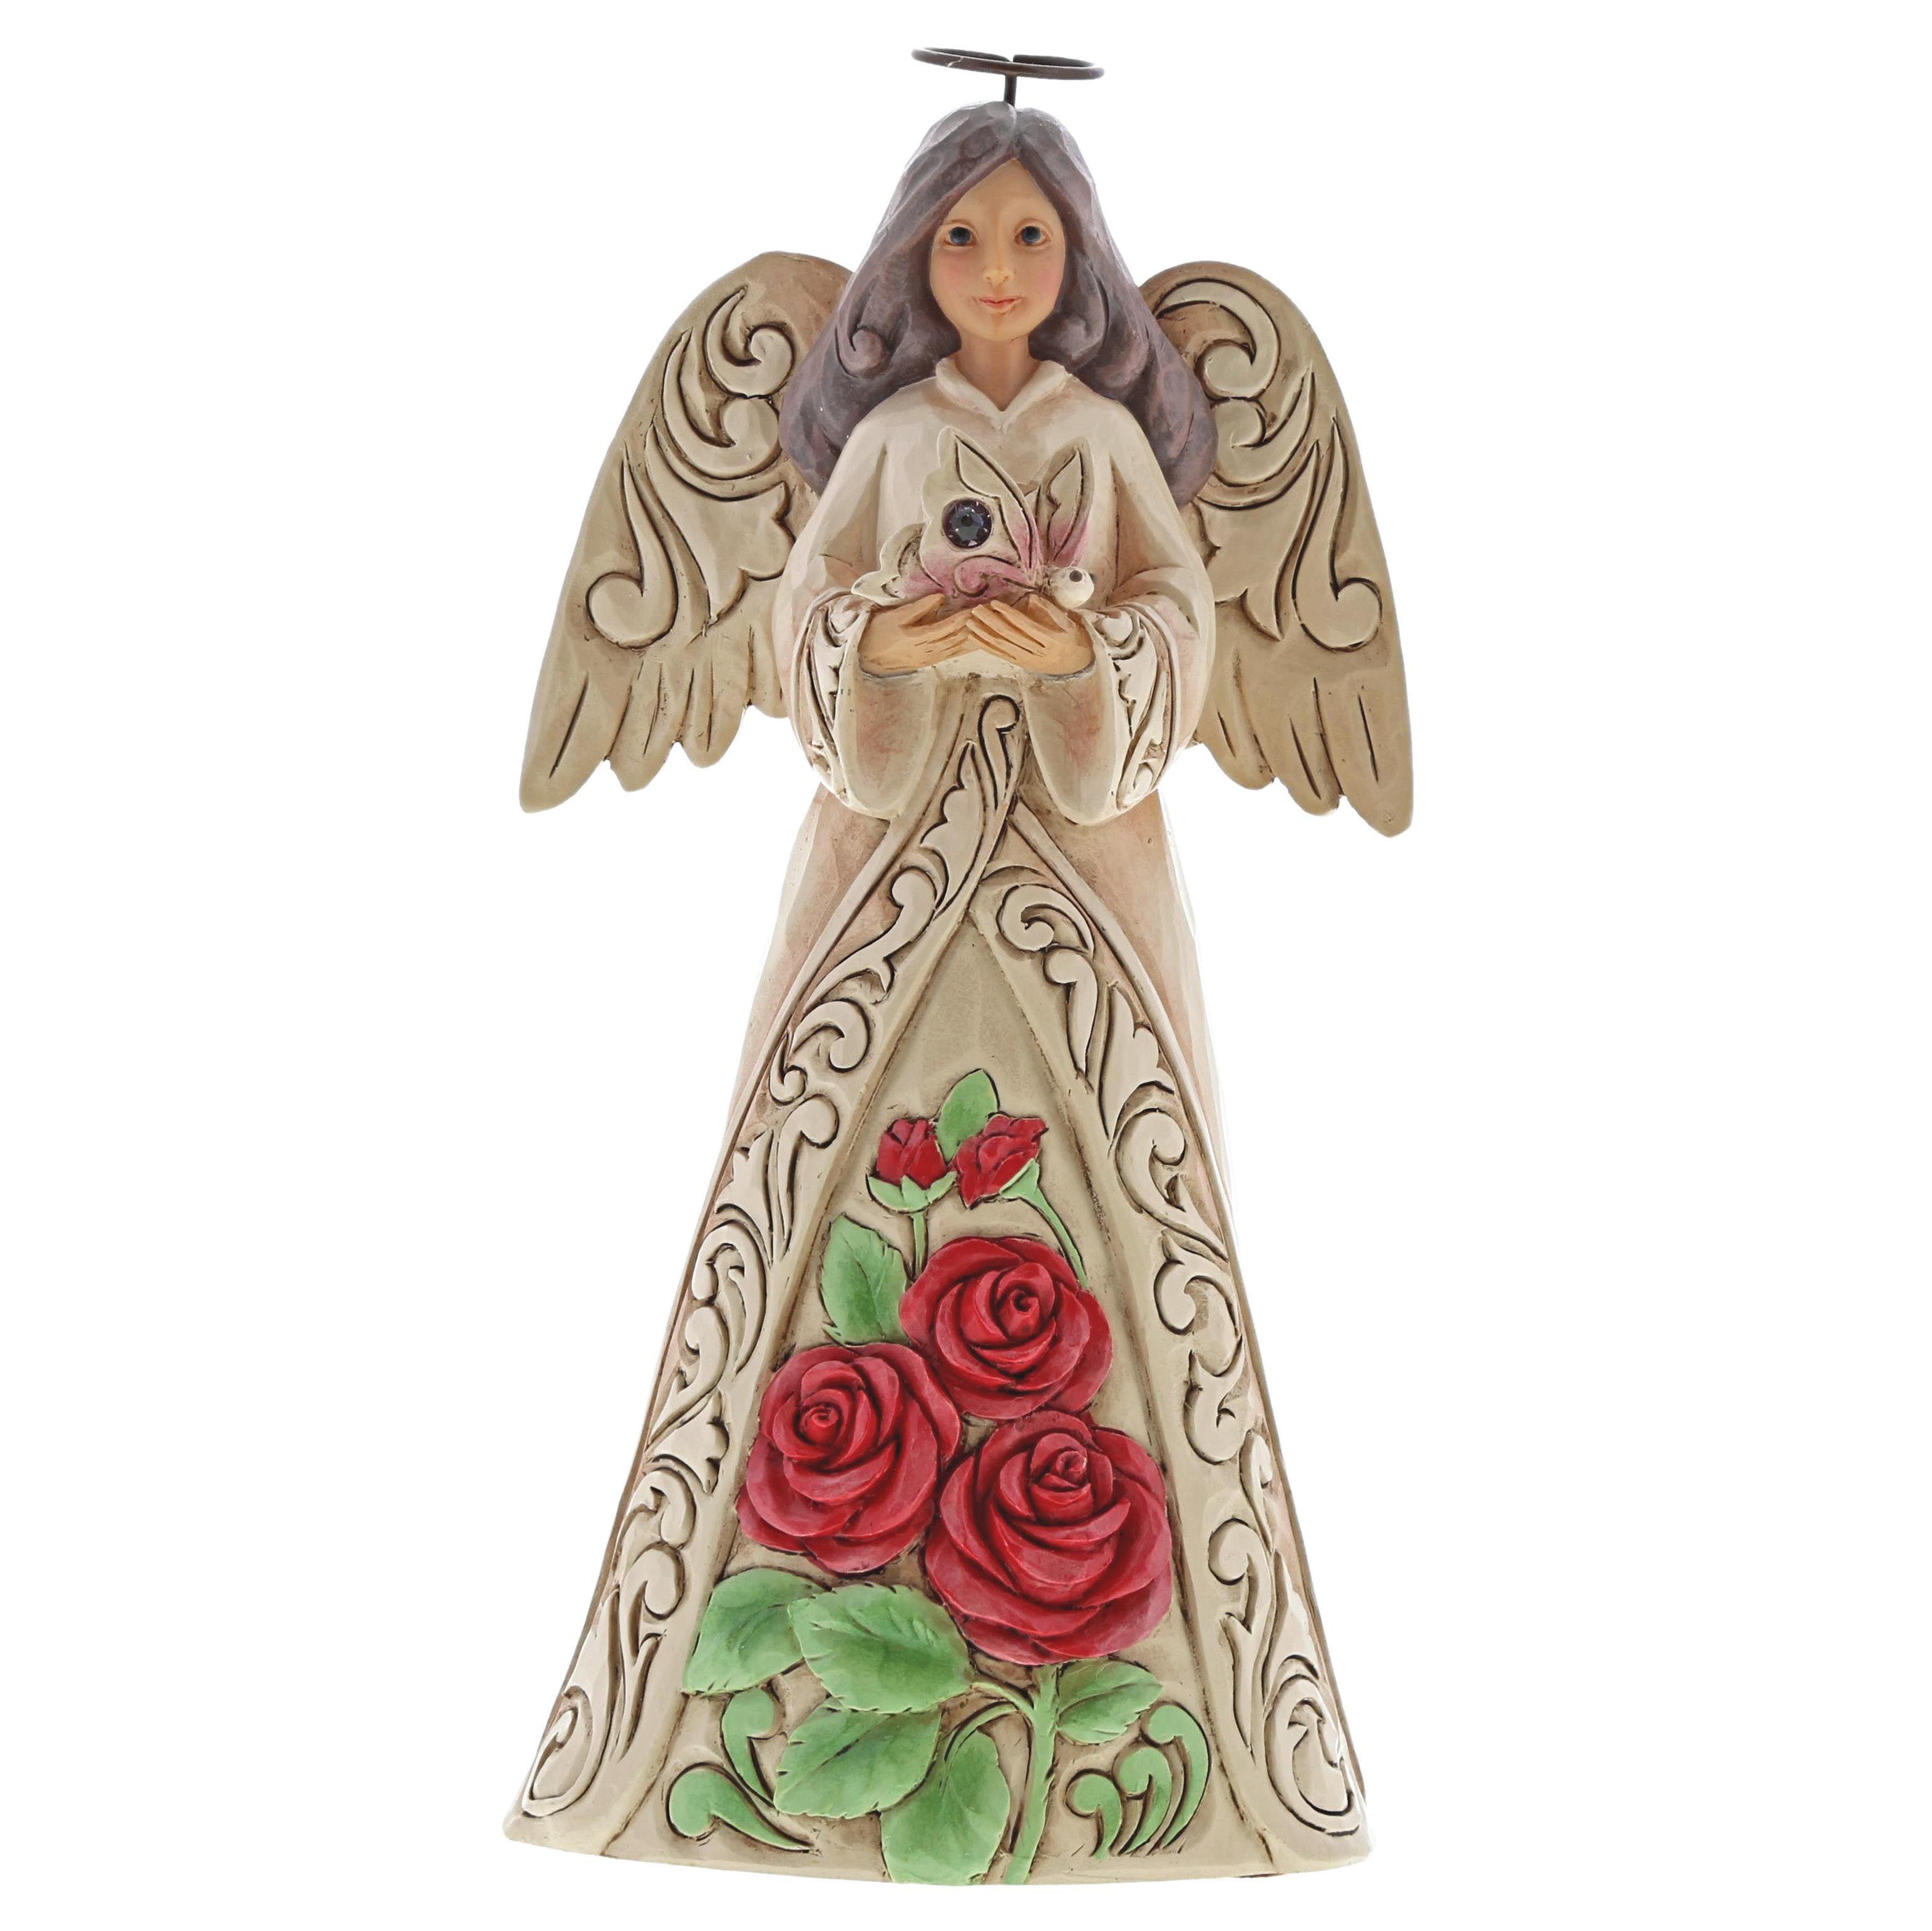 Heartwood creek by jim shore june birthday angel figurine